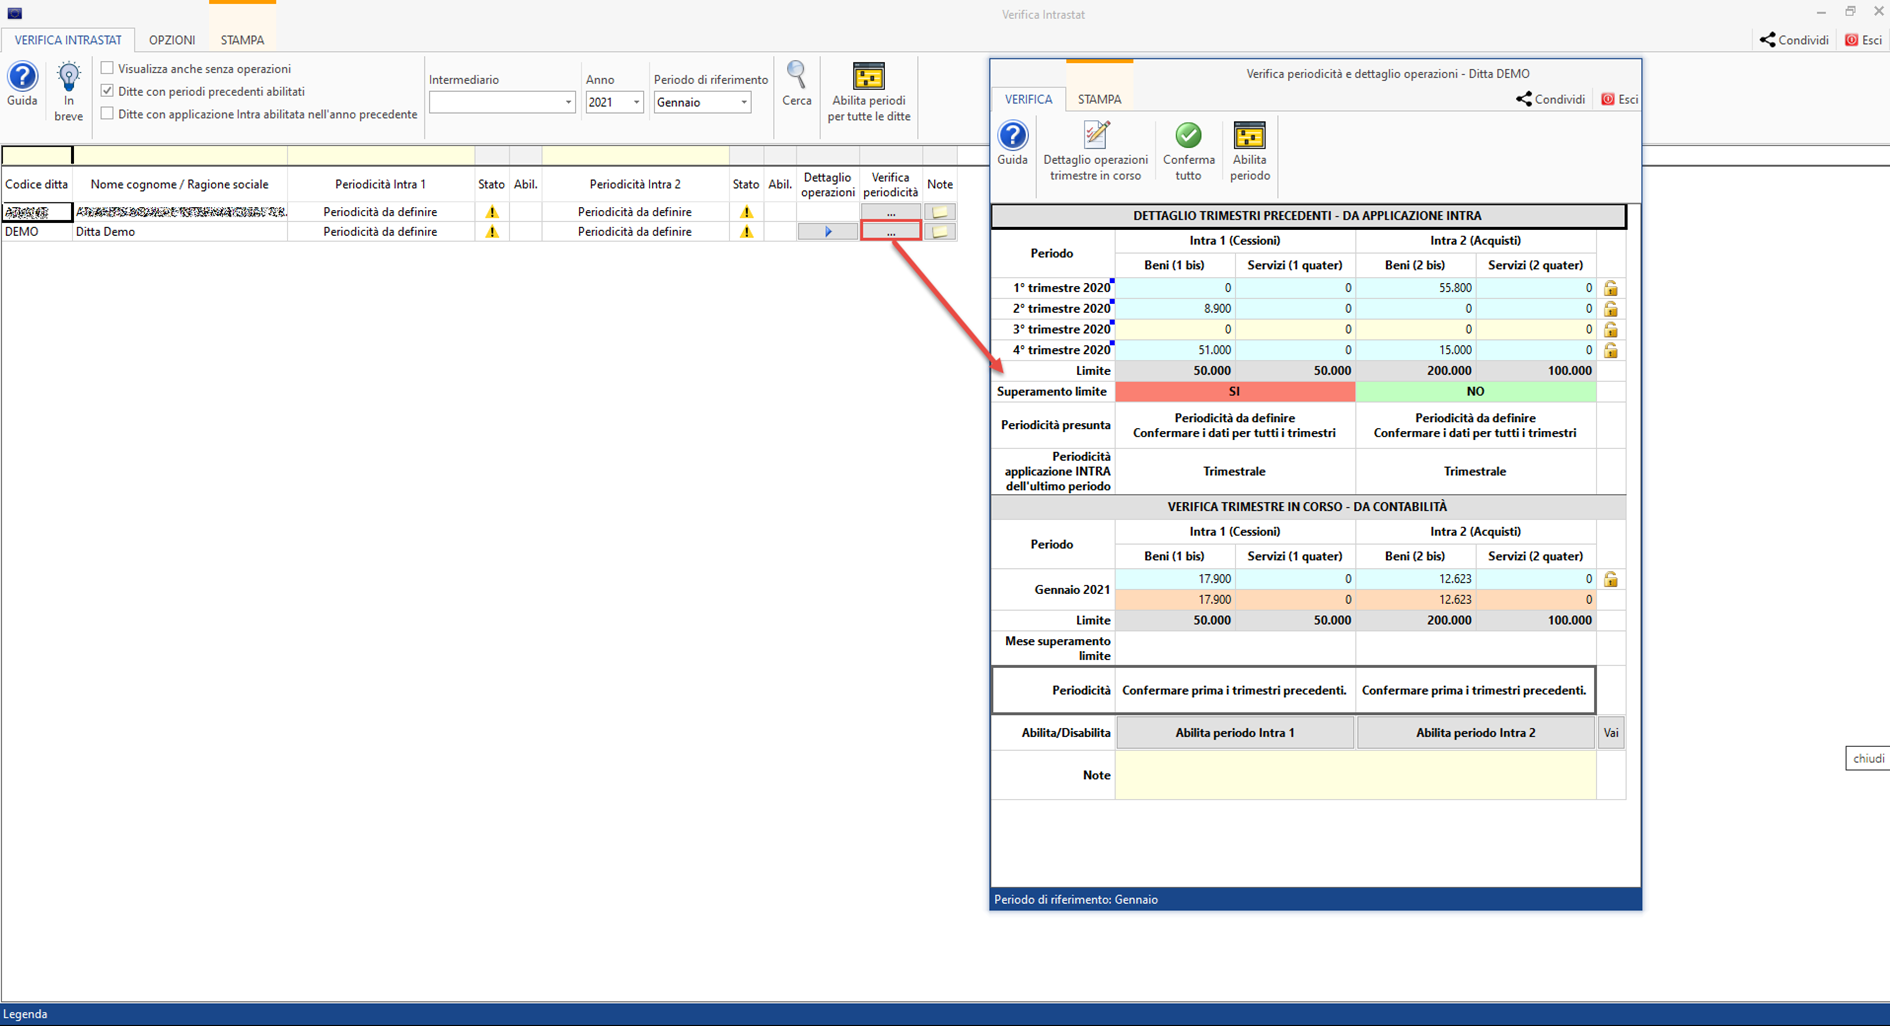 Intrastat: verifica periodicità ed abilitazione dei periodi - Verifica della periodicità